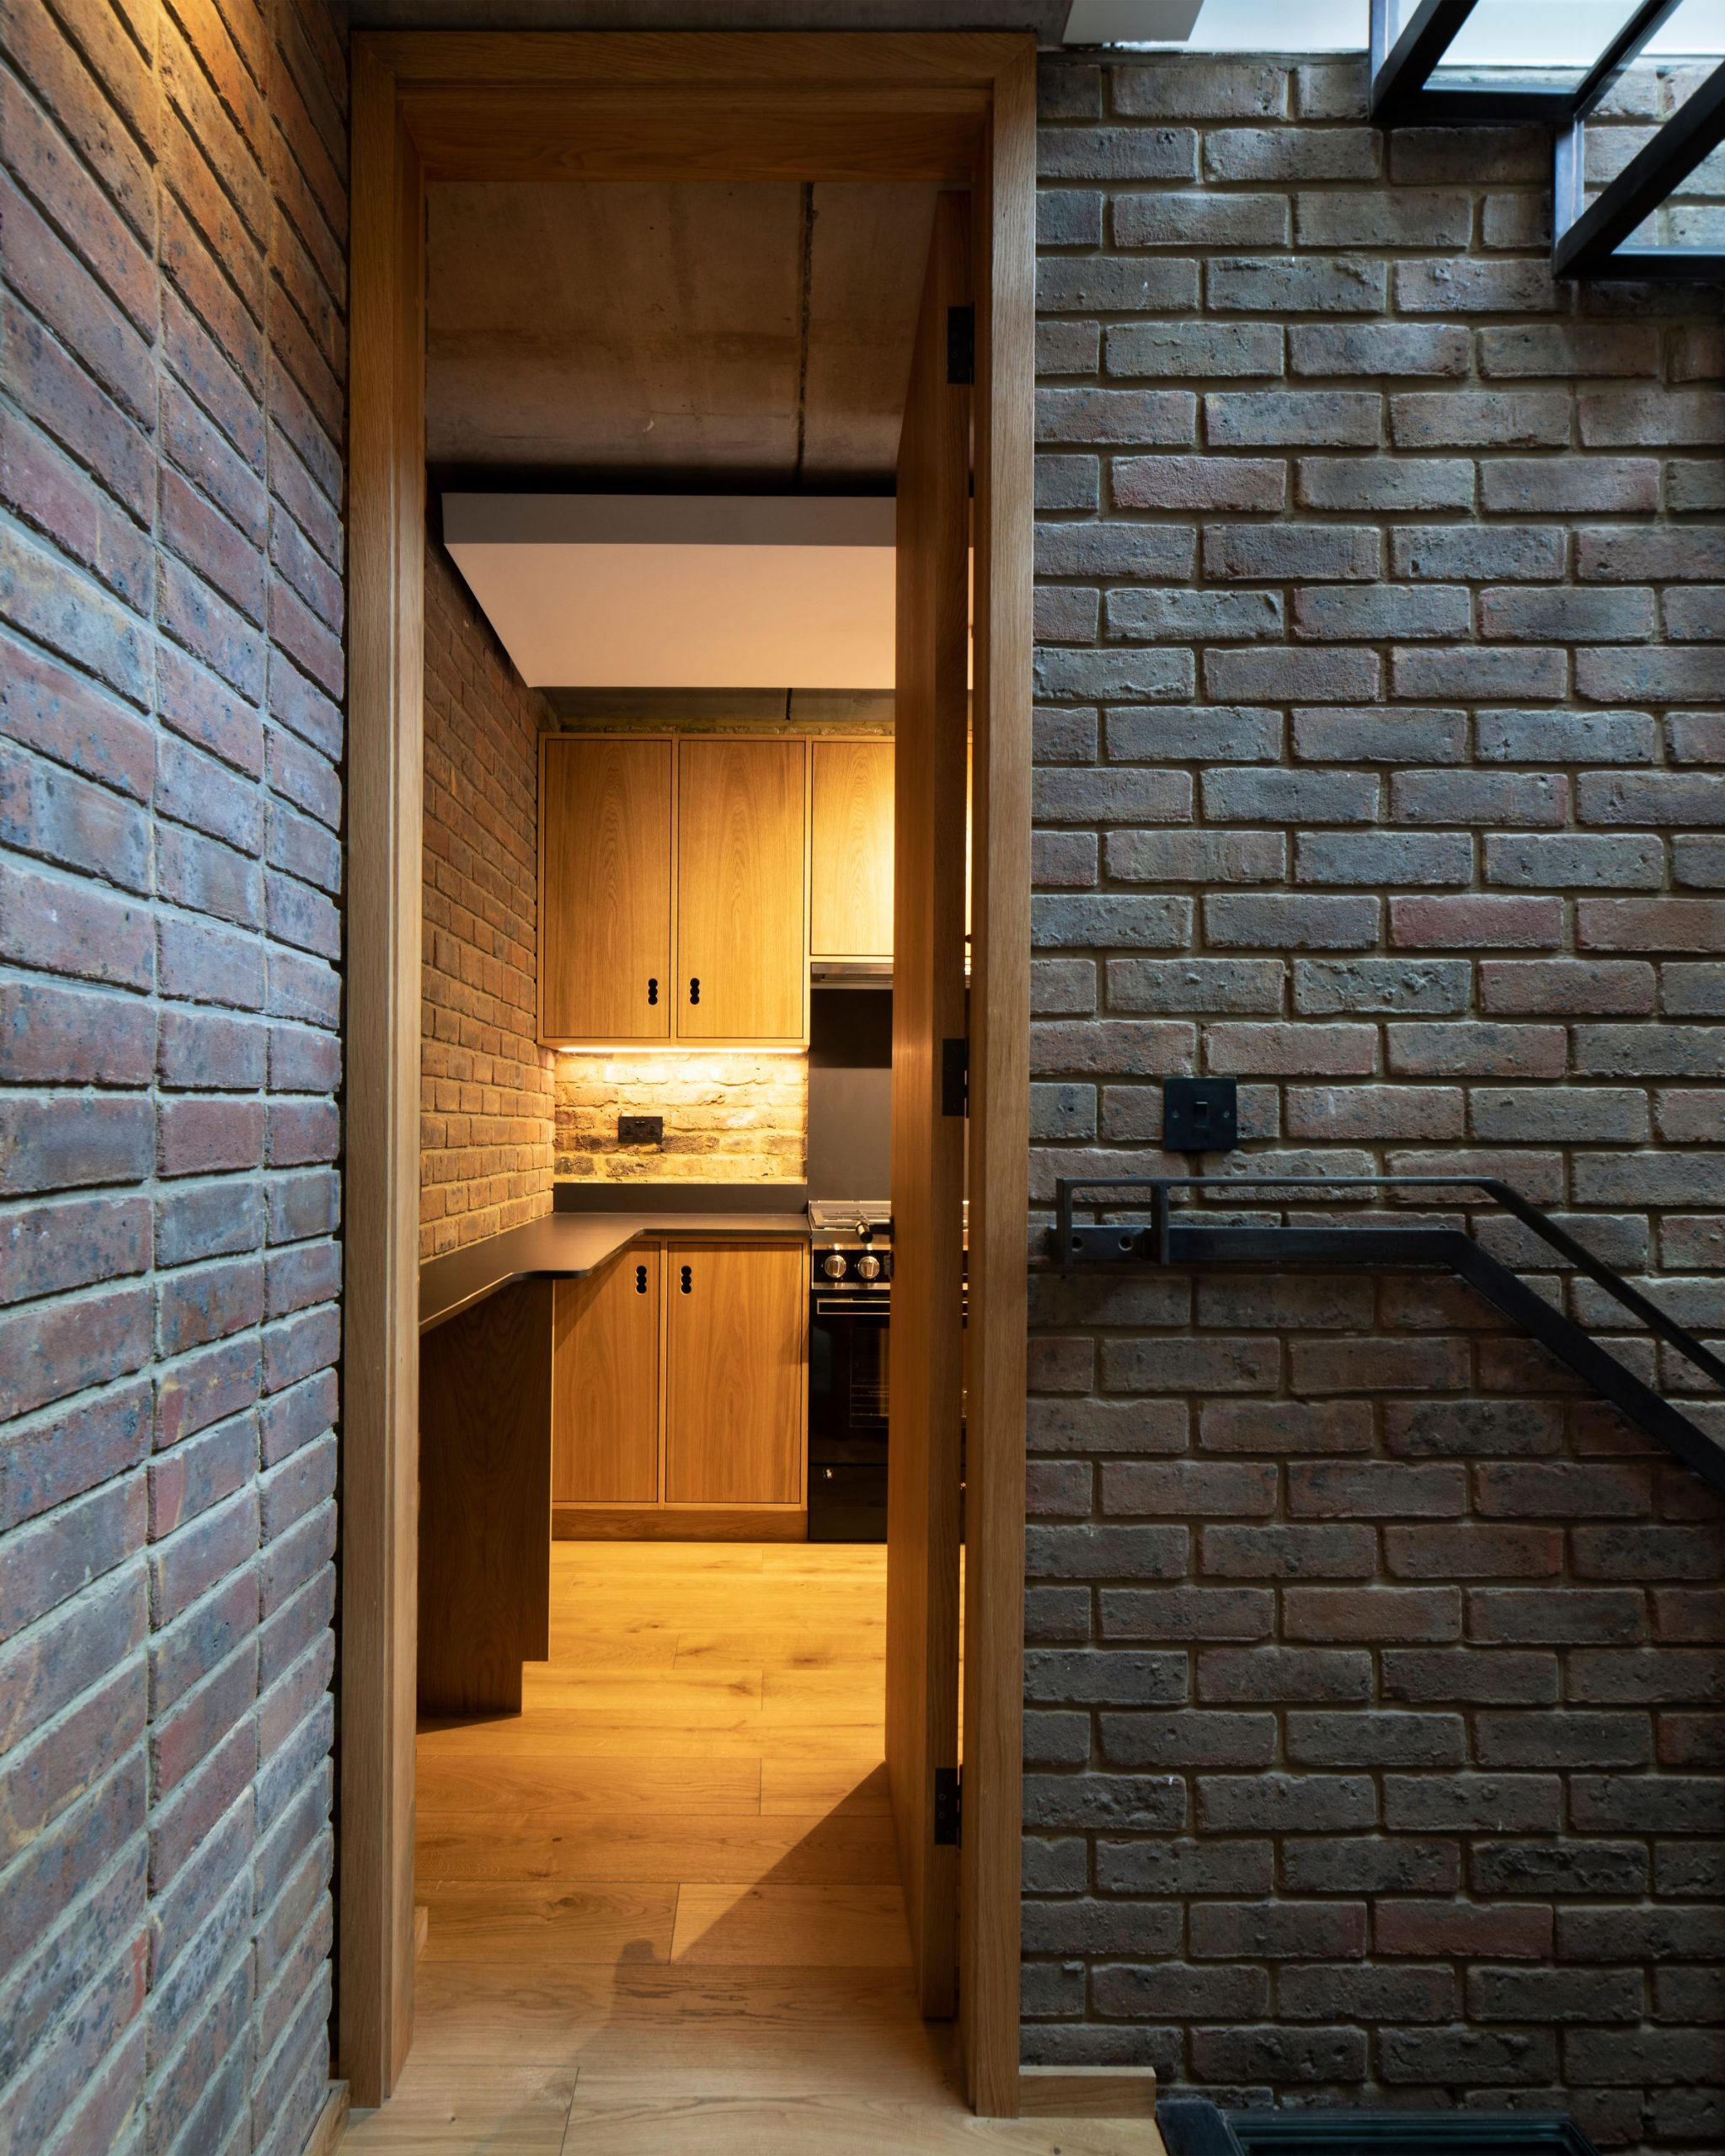 Brick_house25